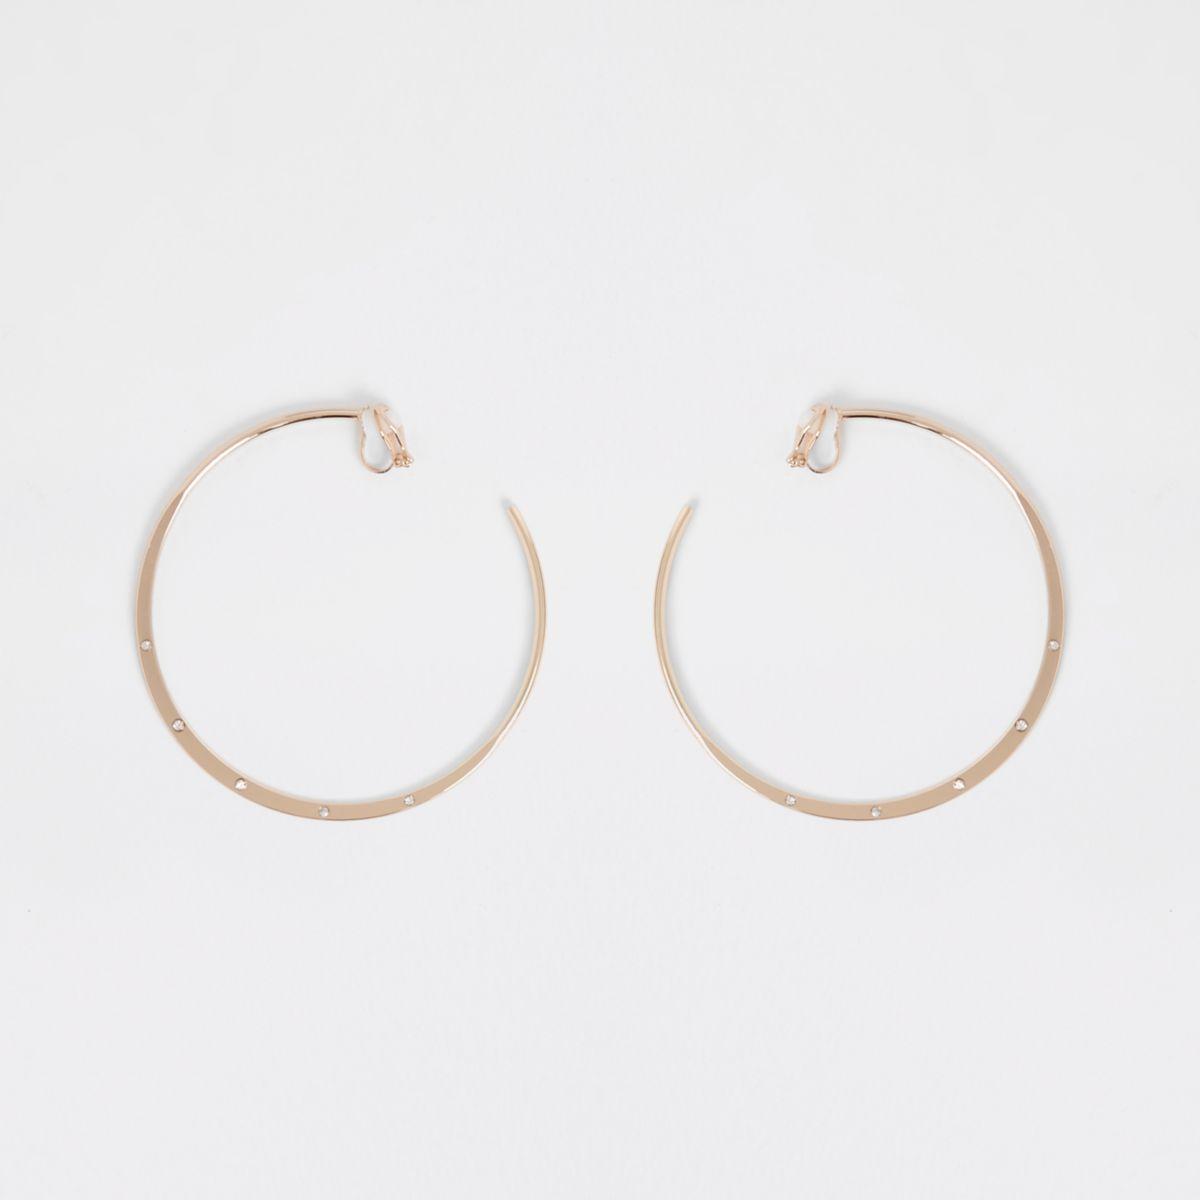 Gold tone clip on hoop earrings